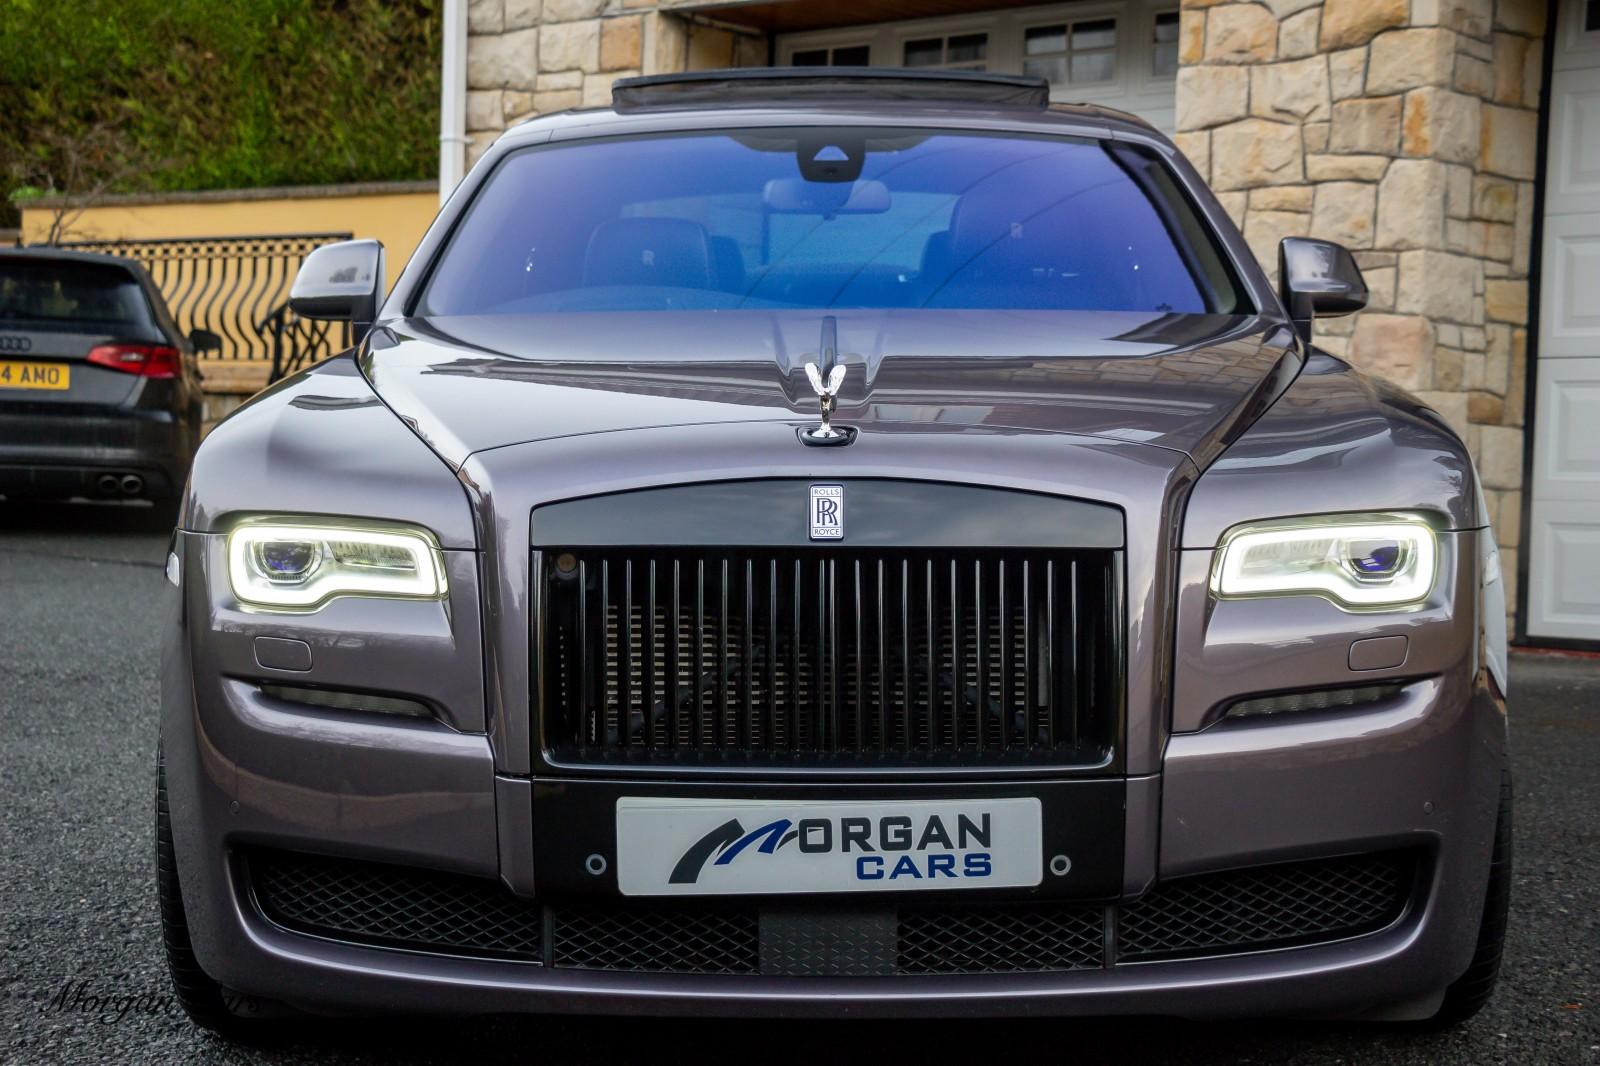 2015 Rolls Royce Ghost 6.6 SERIES 2 Petrol Automatic – Morgan Cars 9 Mound Road, Warrenpoint, Newry BT34 3LW, UK full